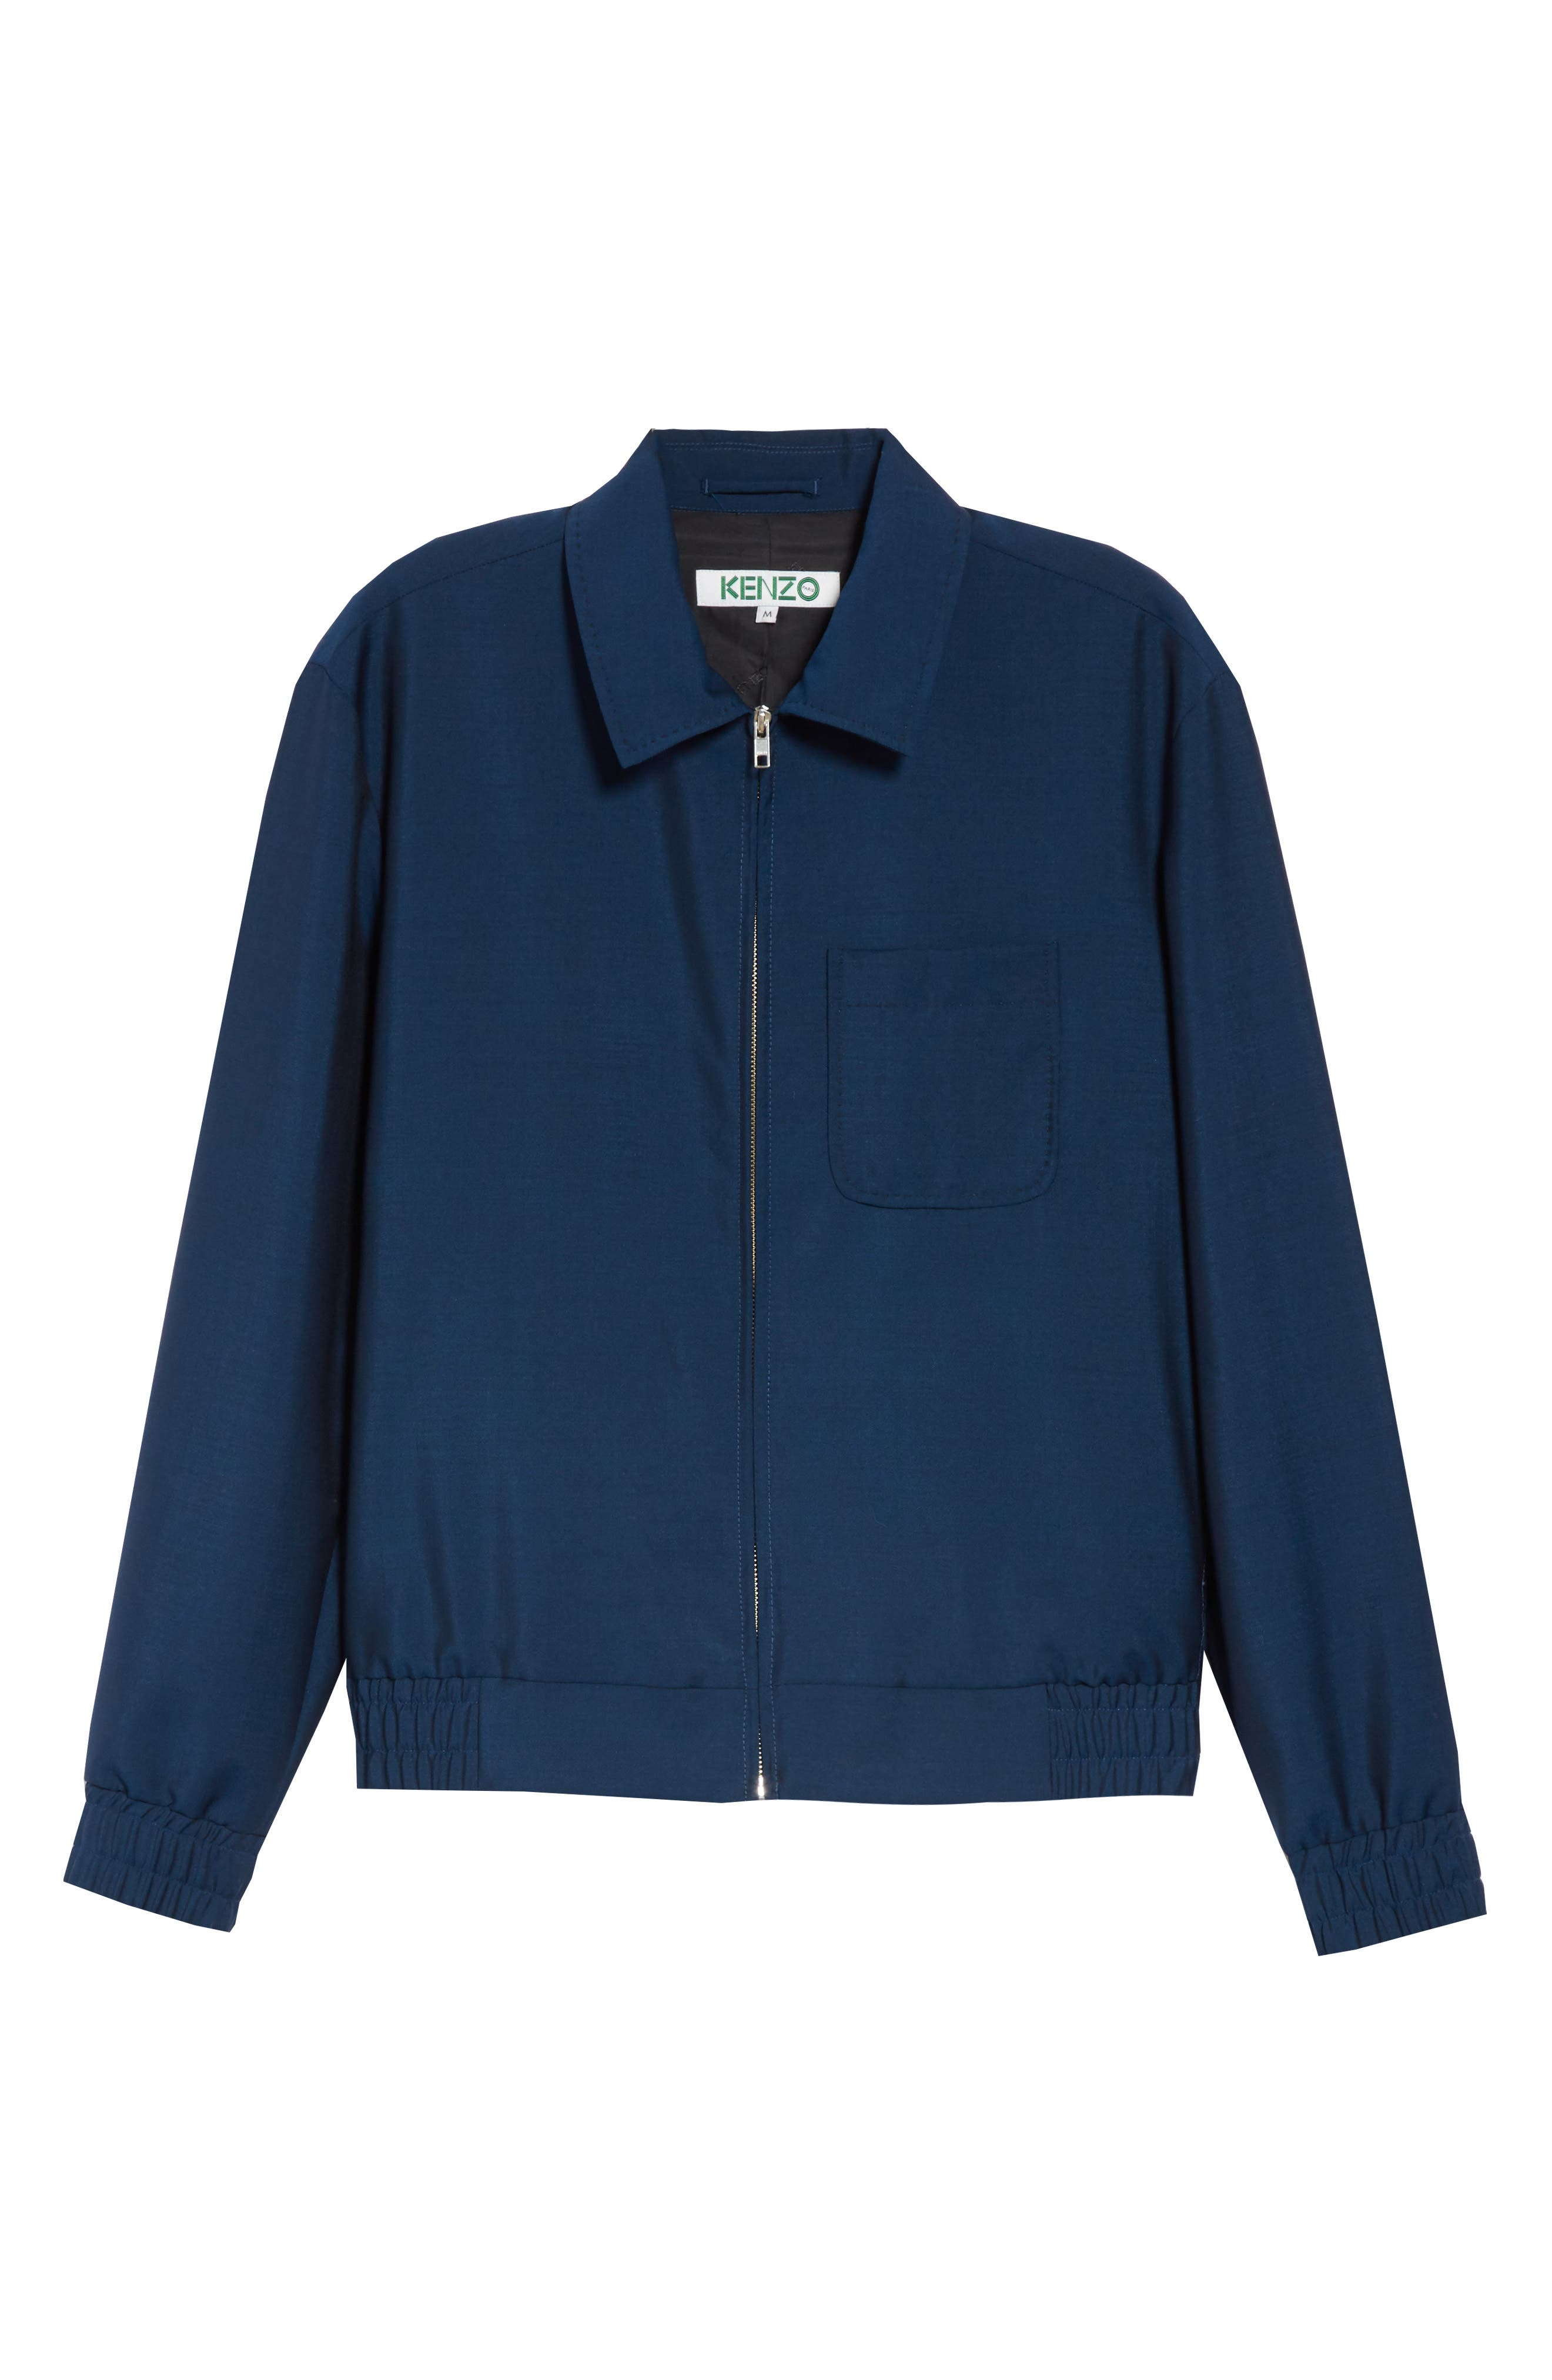 KENZO, Zip Jacket, Alternate thumbnail 6, color, DUCK BLUE